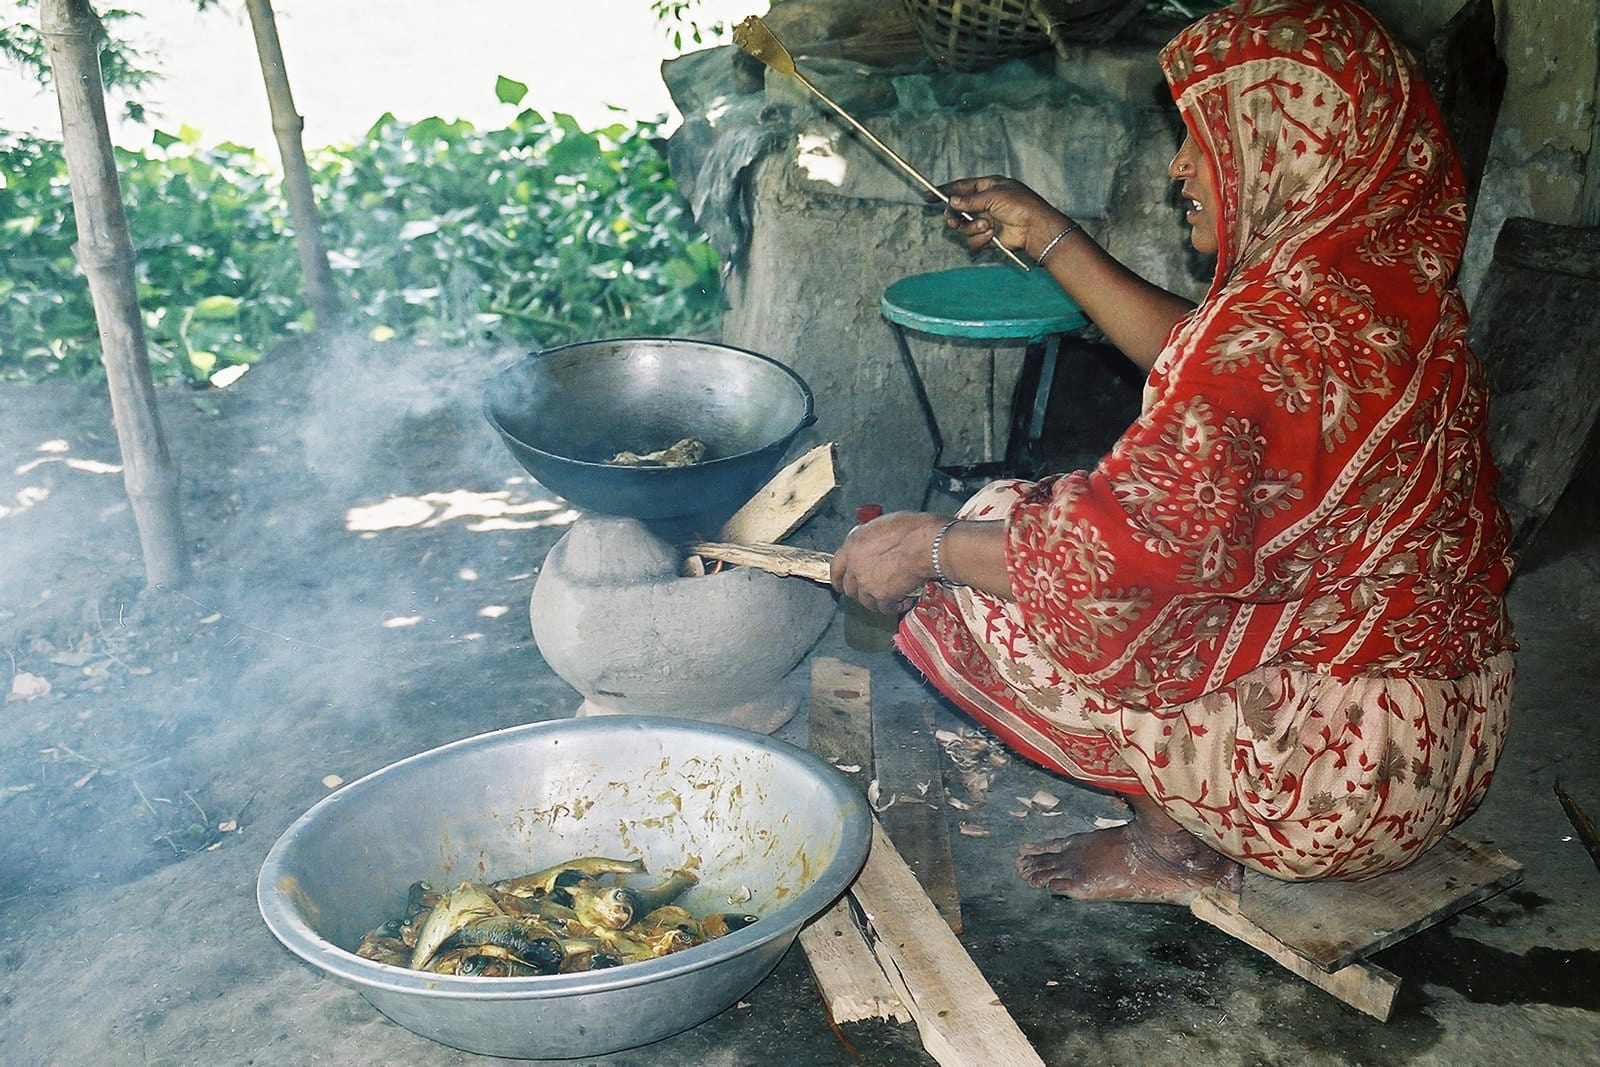 Cooking a traditional fish dinner in Bangladesh. Photo by CBFM-Fem Com Bangladesh.